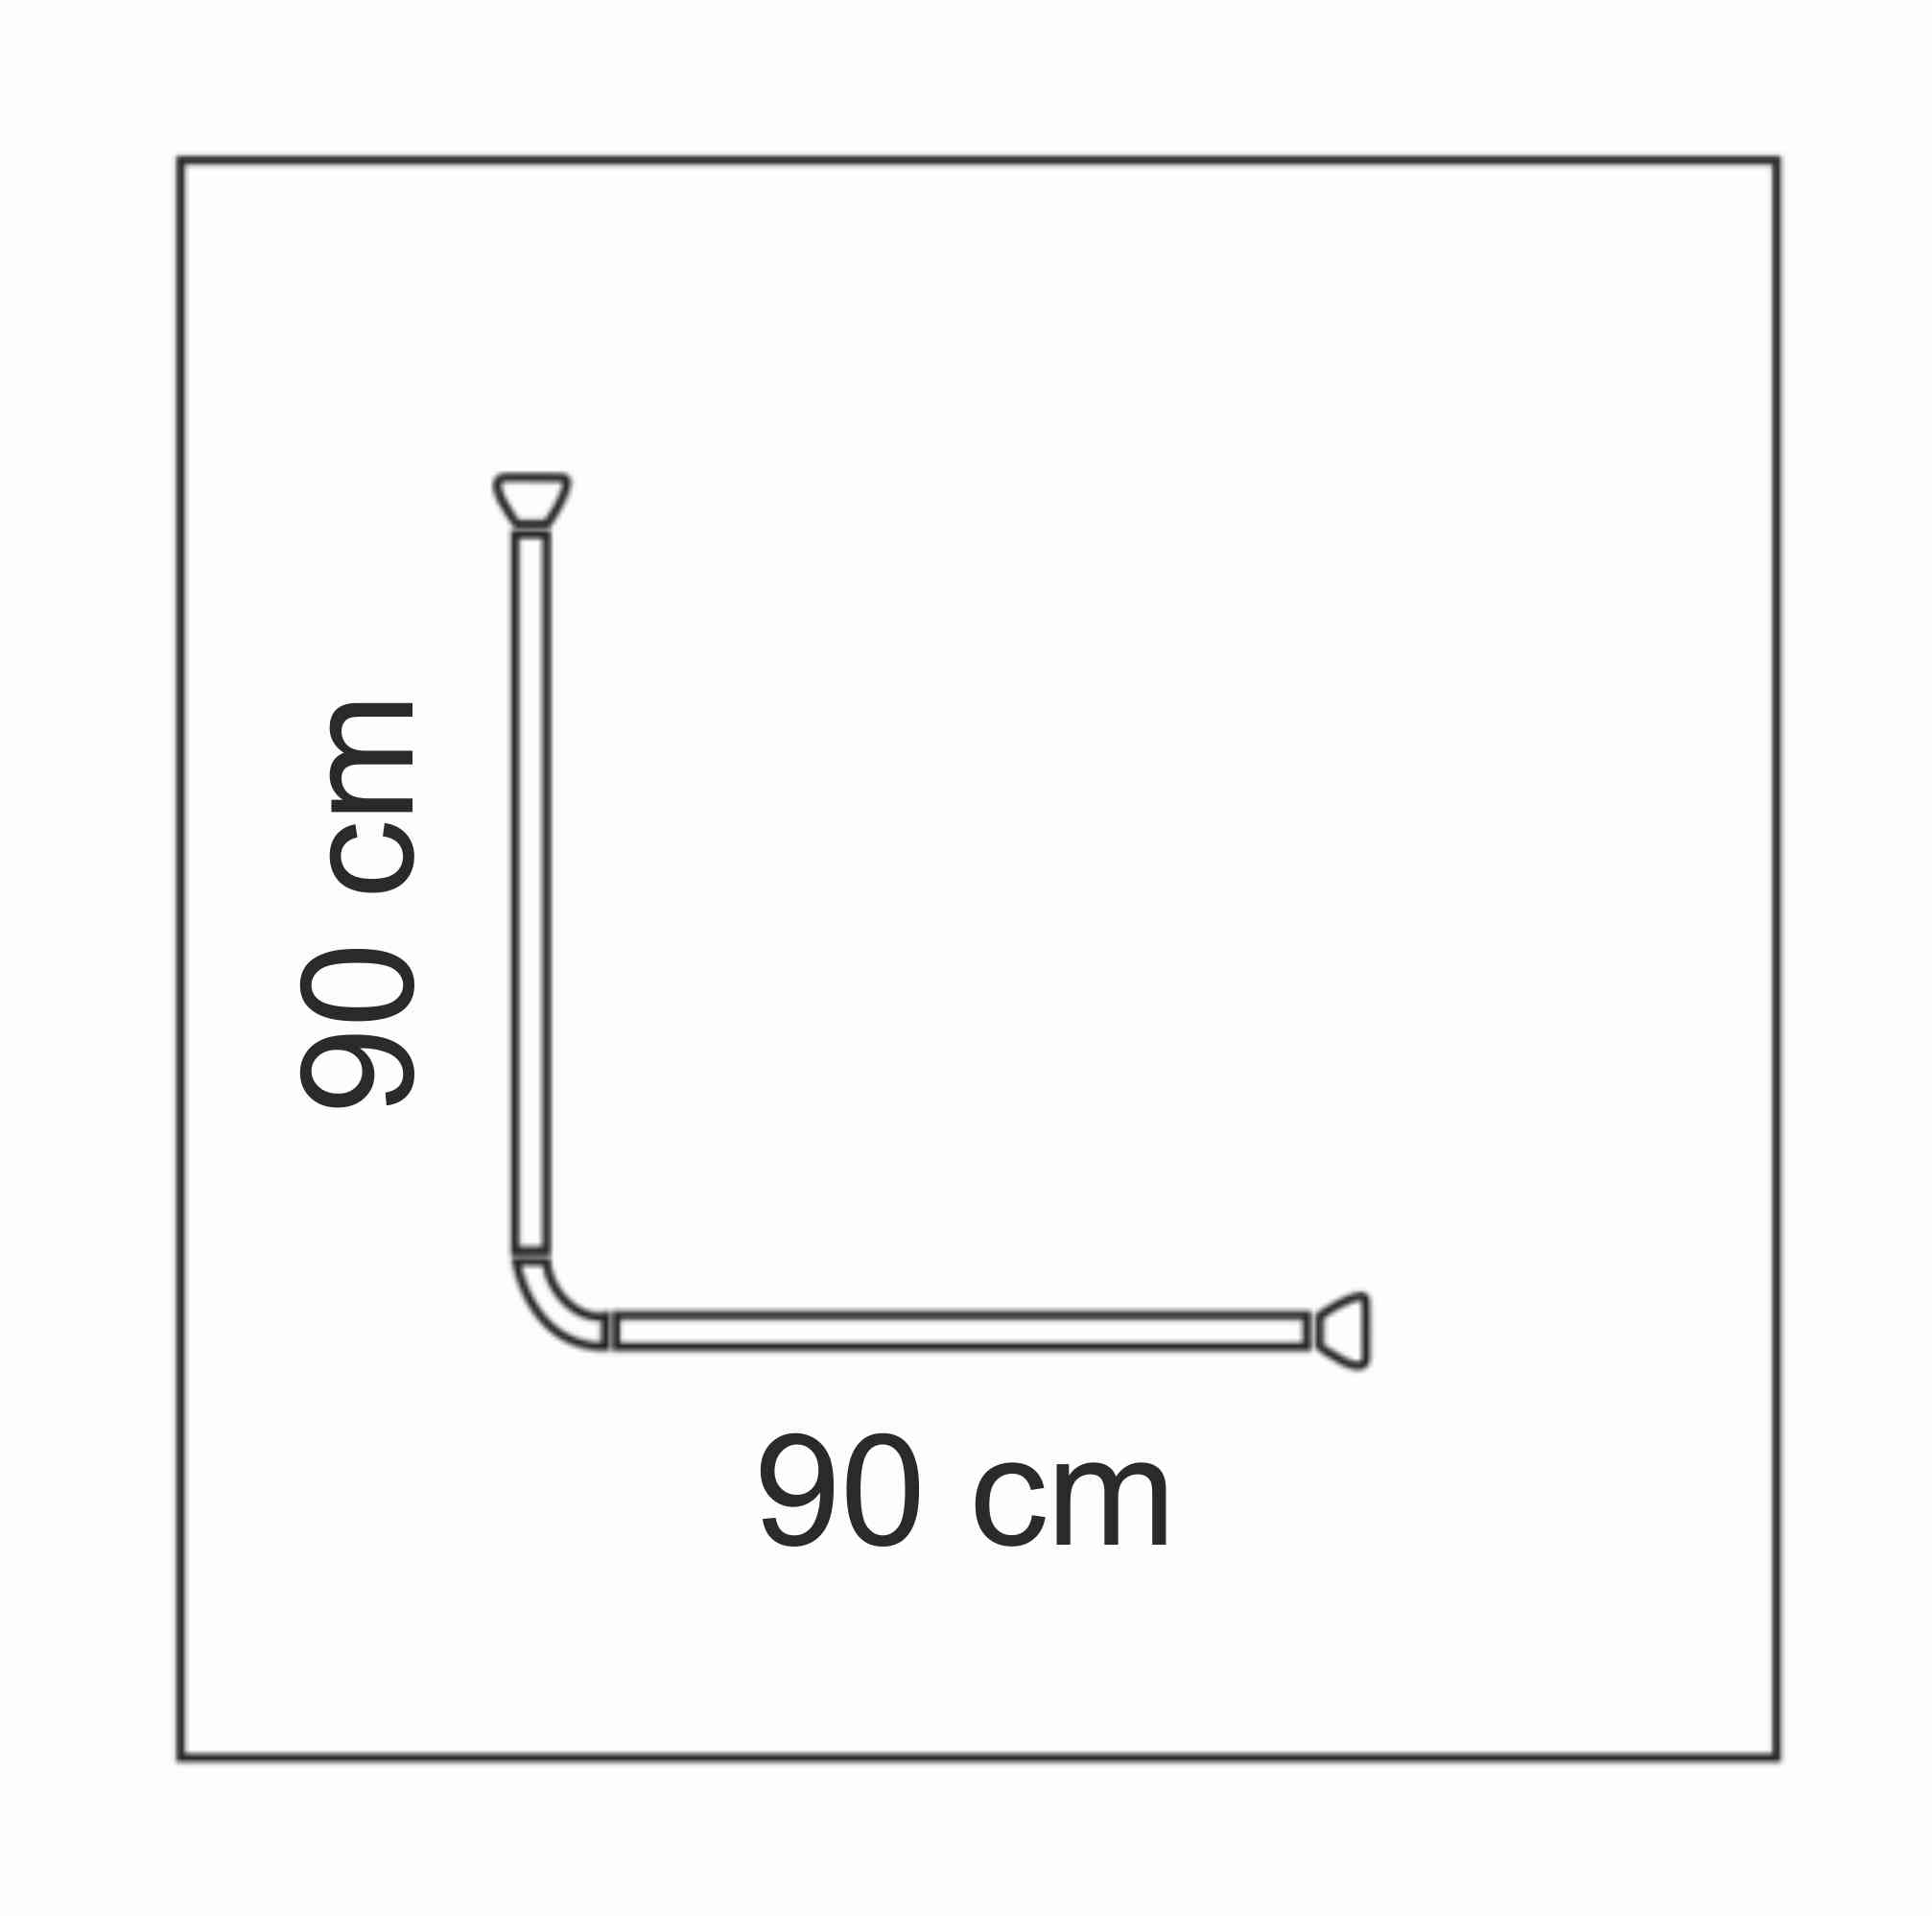 90x90 cm-es zuhanyfüggöny tartó, zuhanykarnis